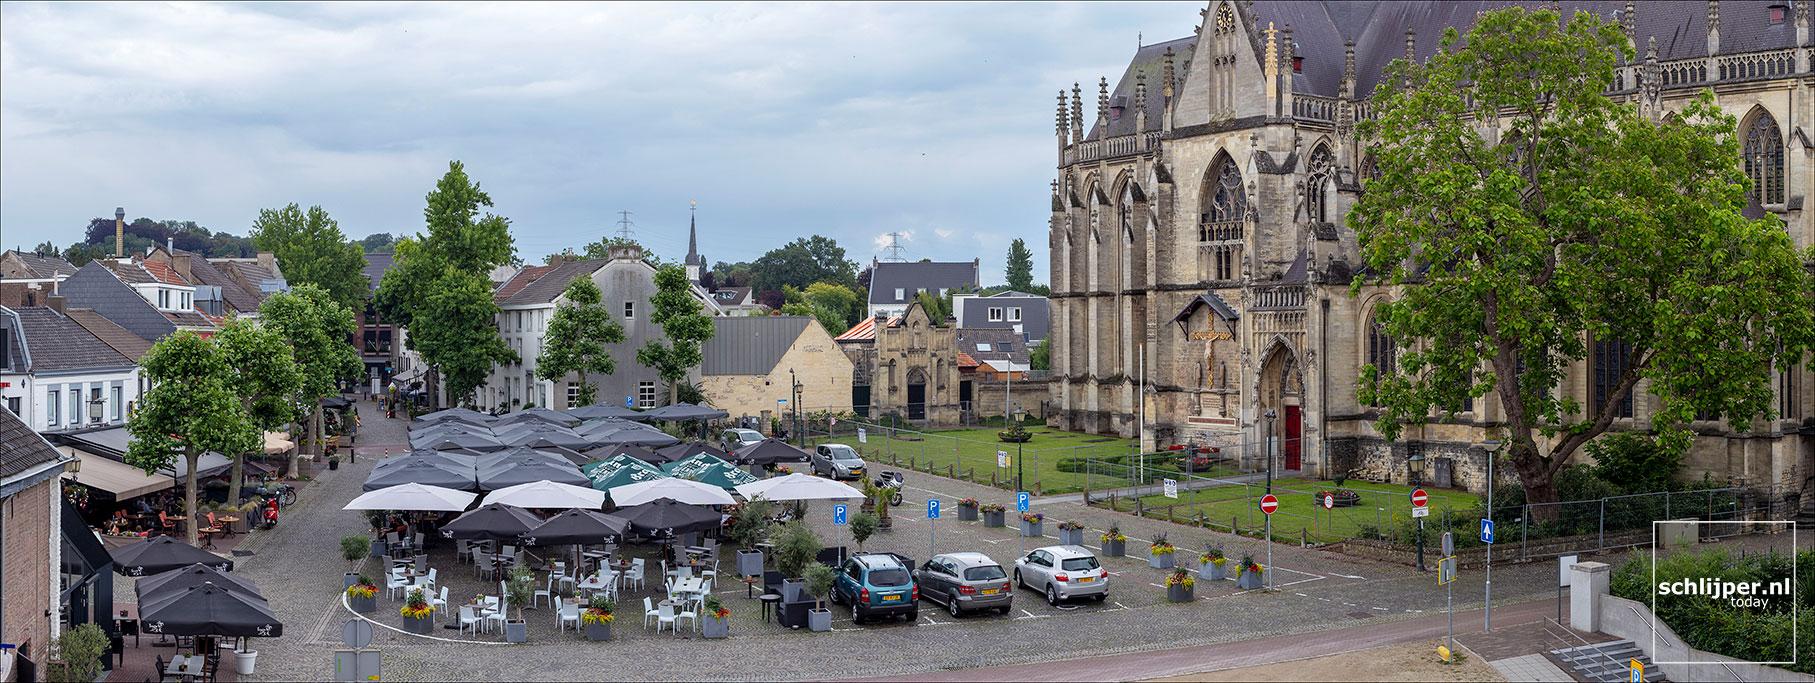 Nederland, Meerssen, 11 juli 2020